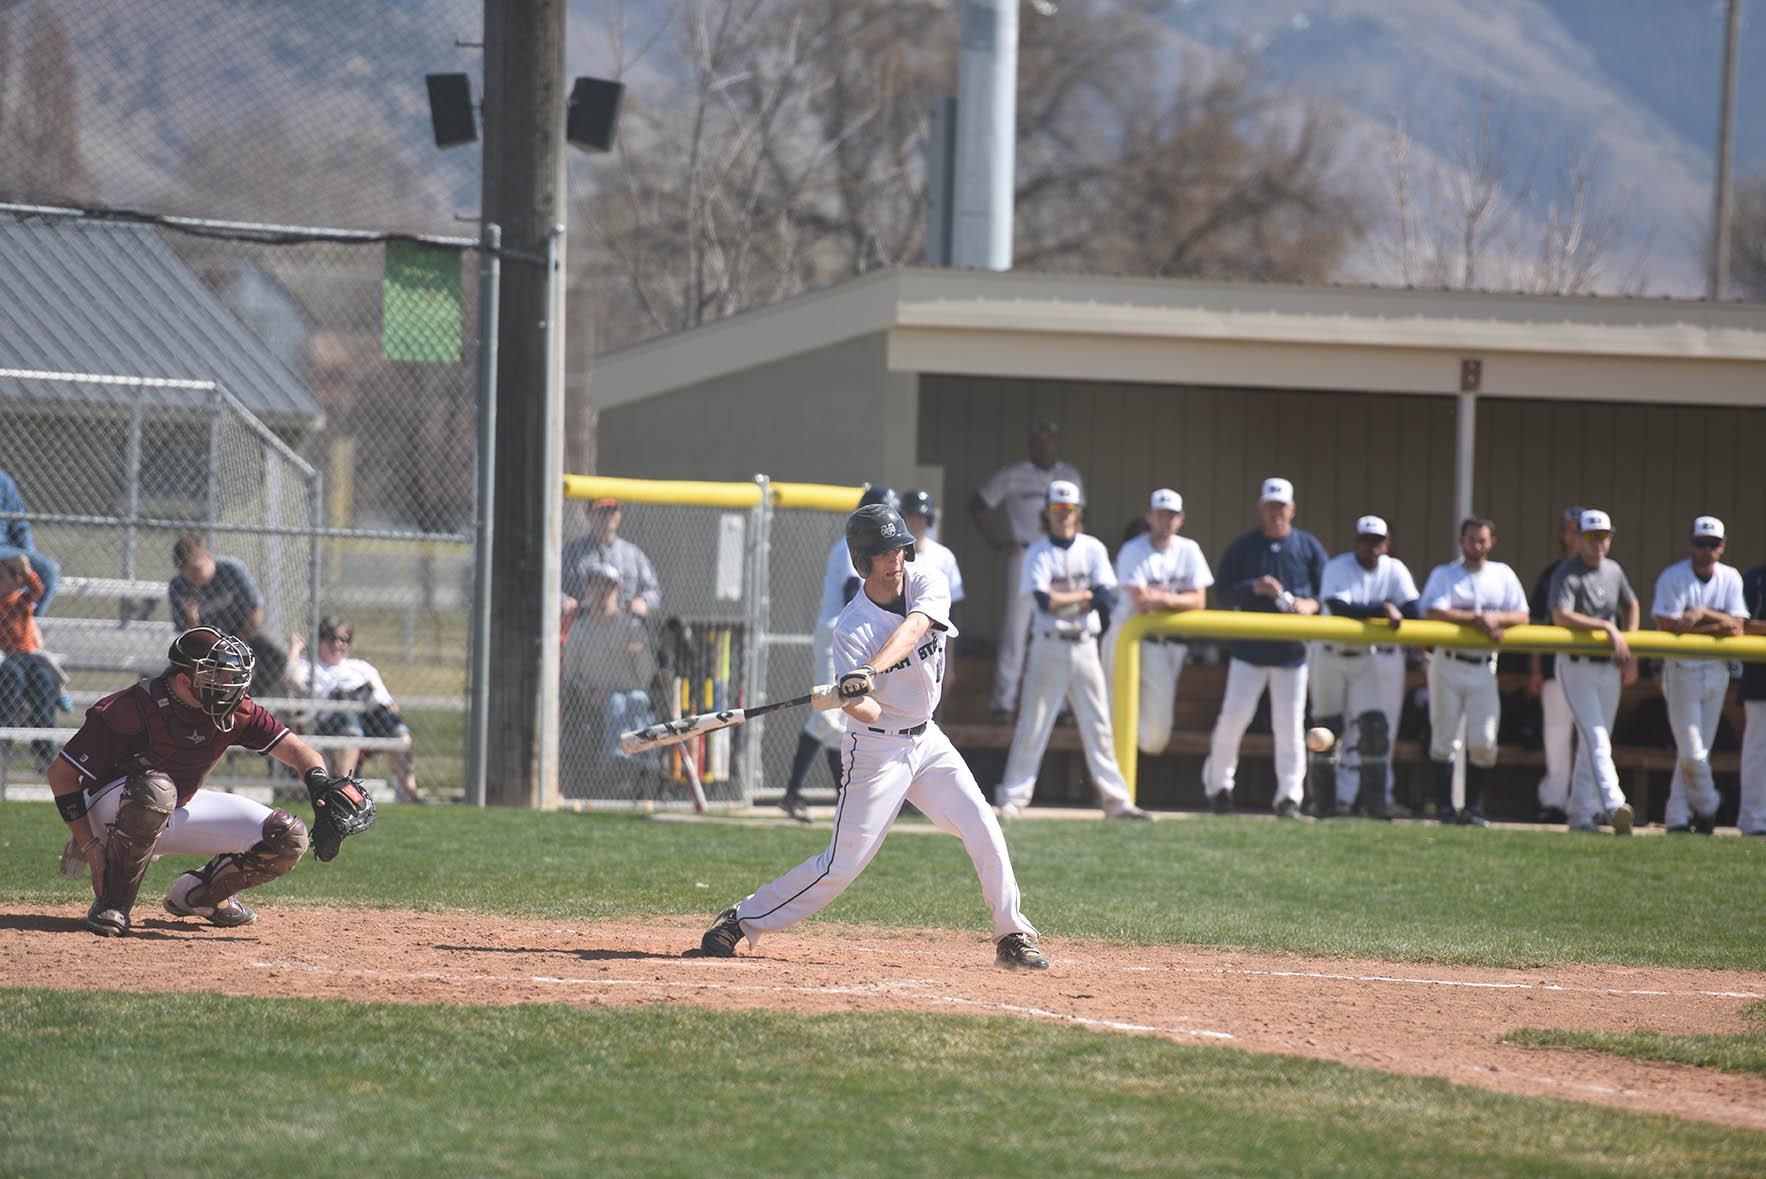 USU baseball takes on Montana in double-header